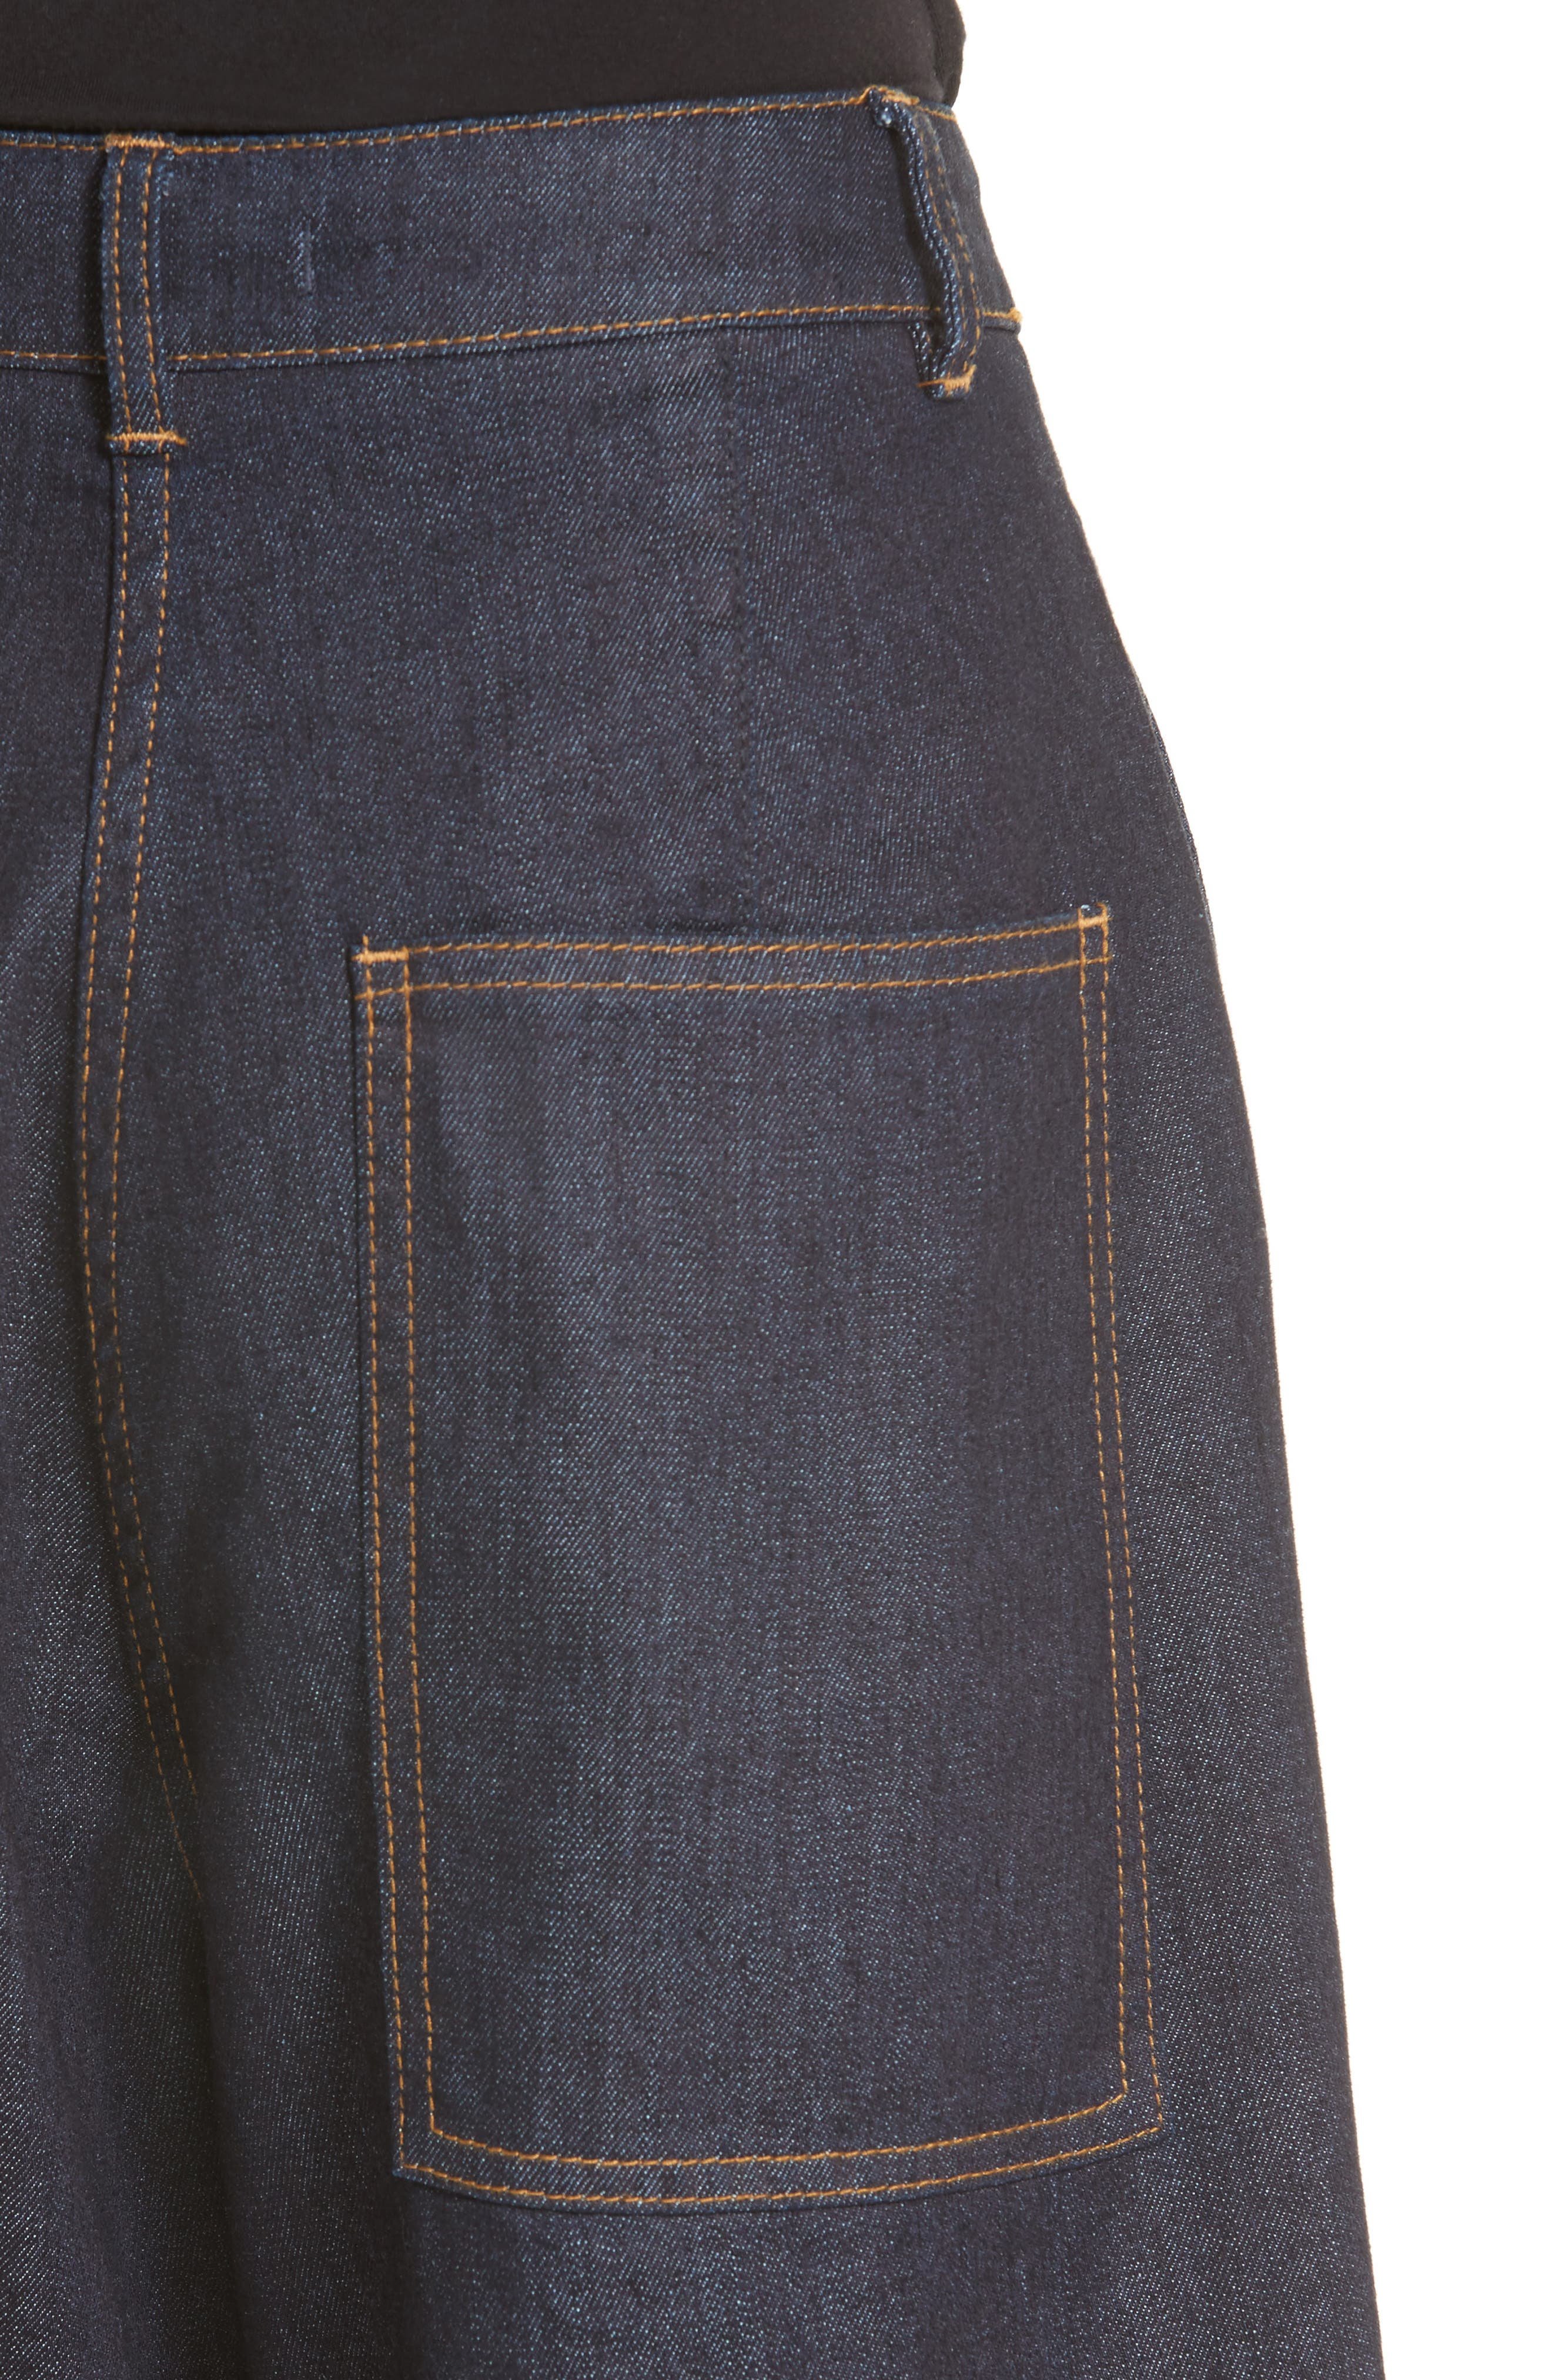 Sam High Waist Culotte Jeans,                             Alternate thumbnail 5, color,                             Dark Denim